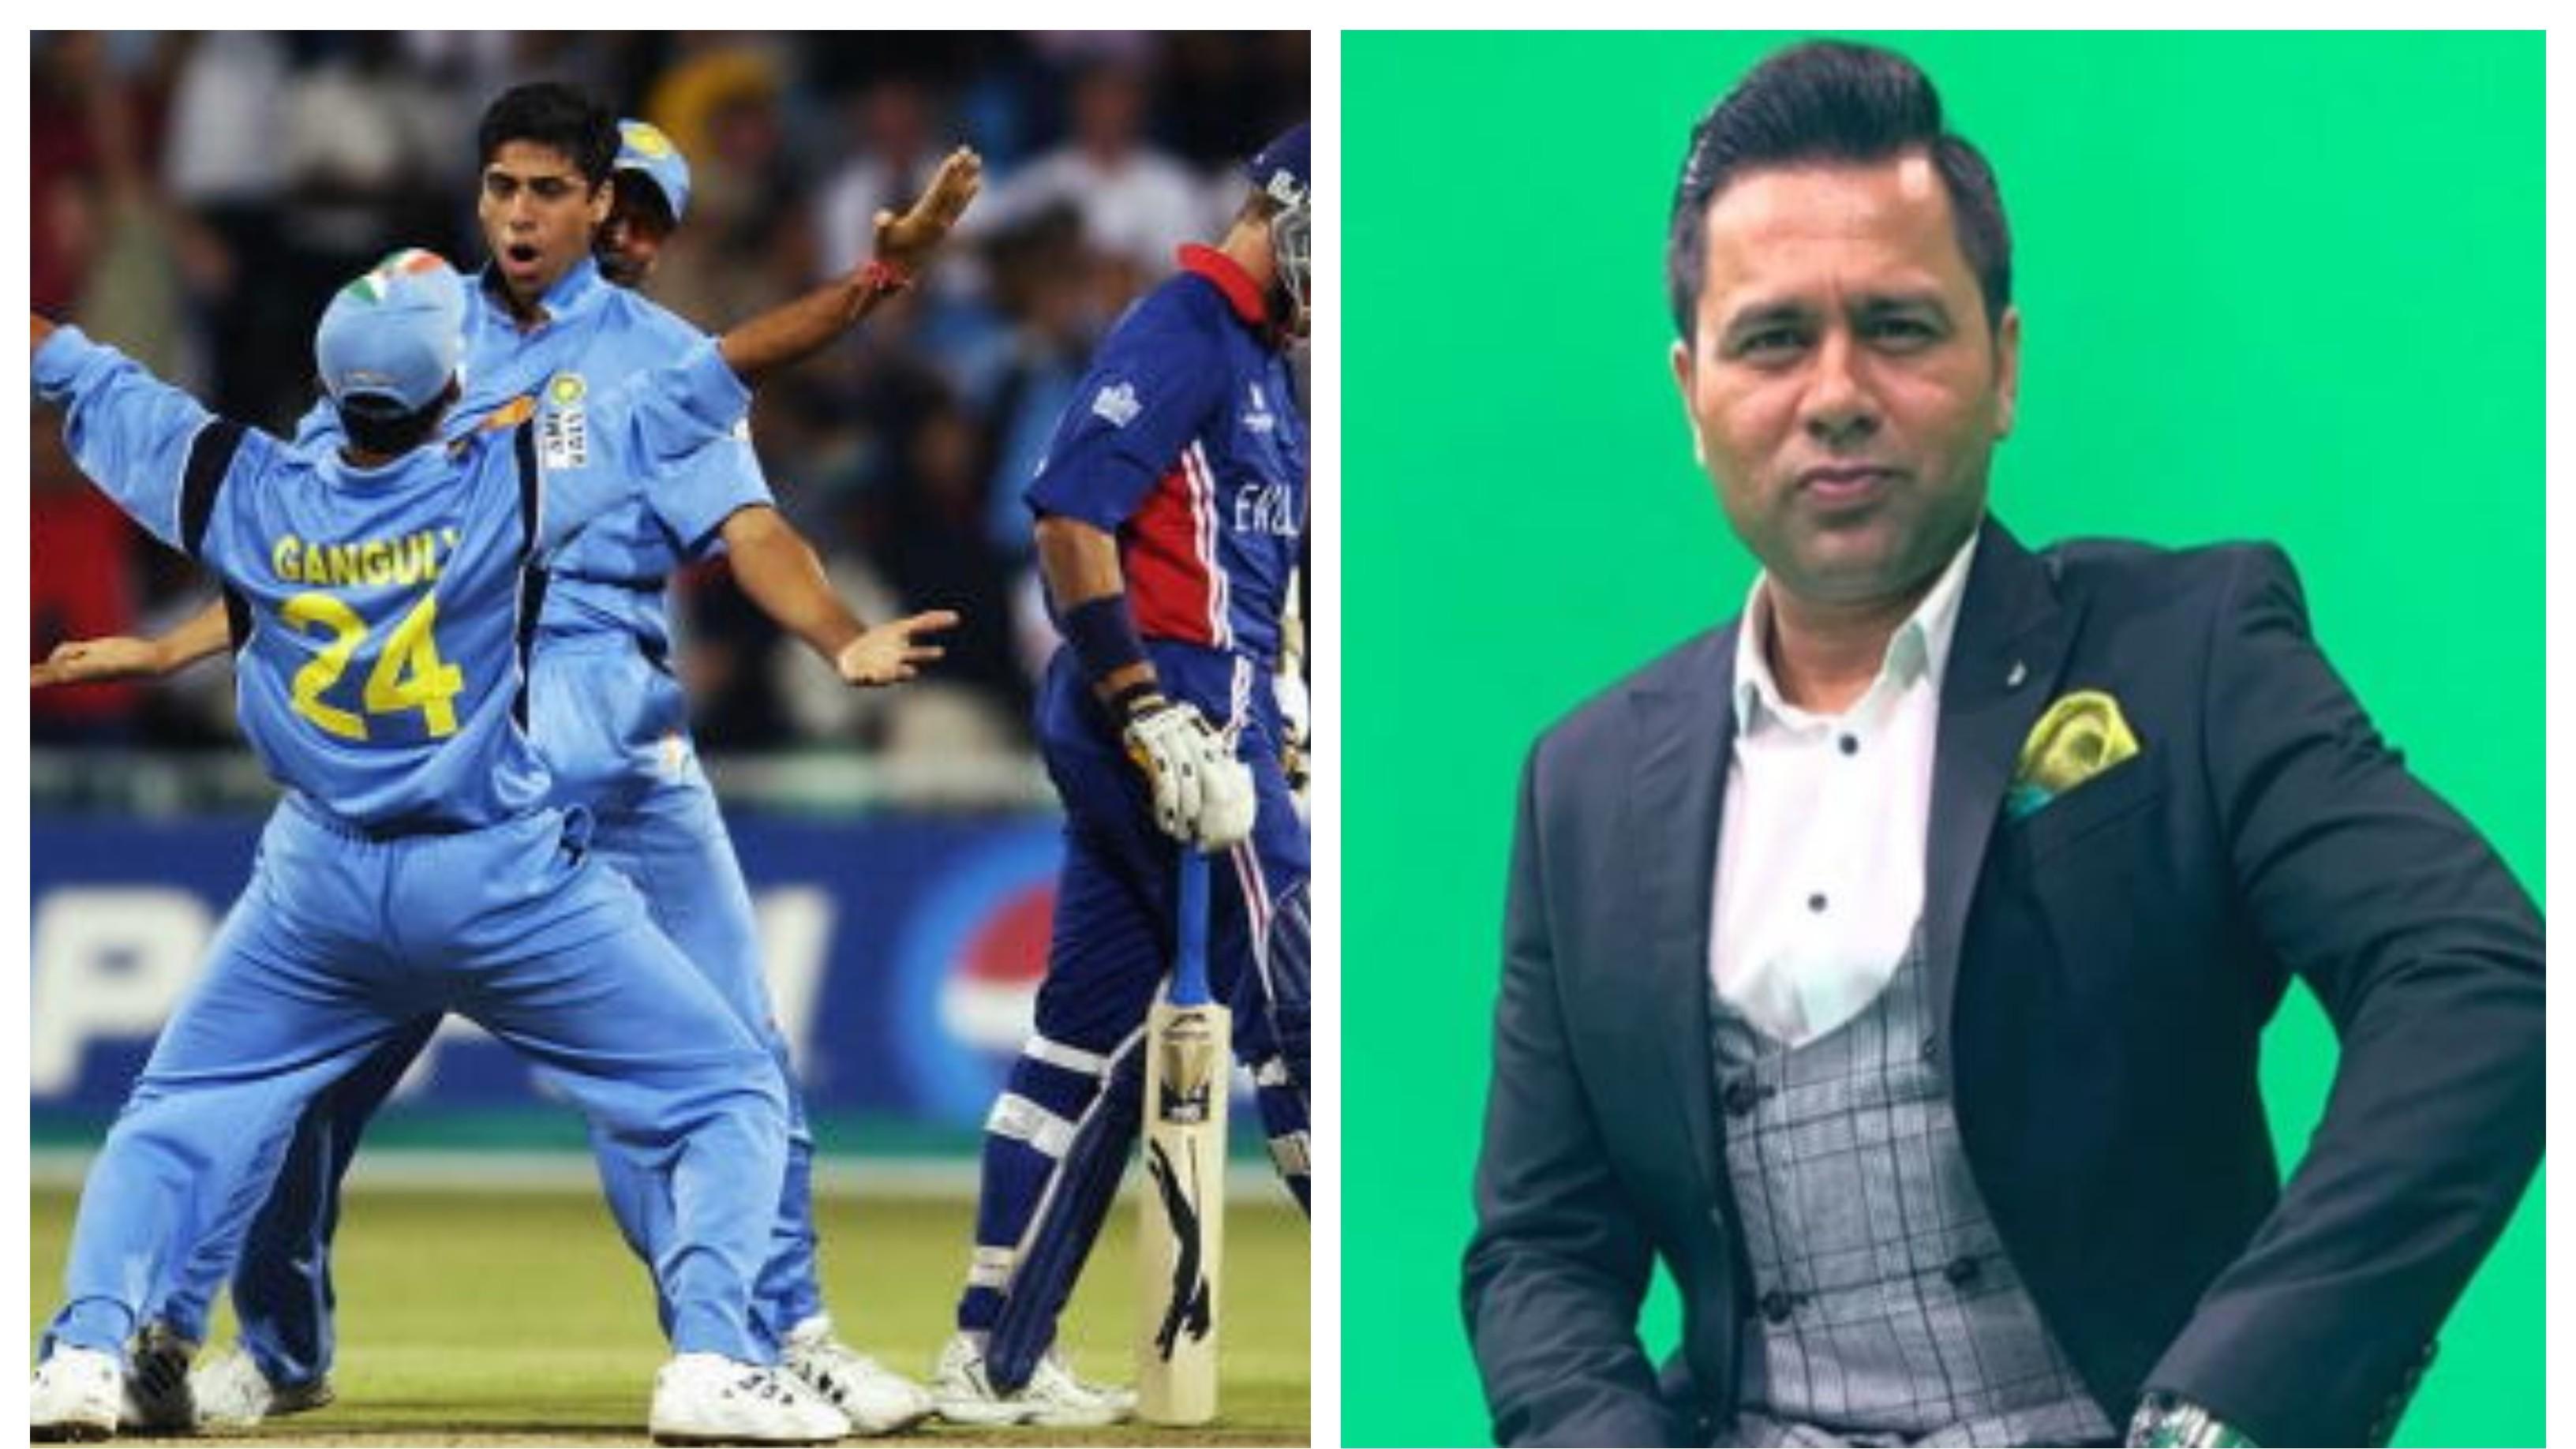 Aakash Chopra recalls how Ashish Nehra overcame pain to shine at 2003 World Cup